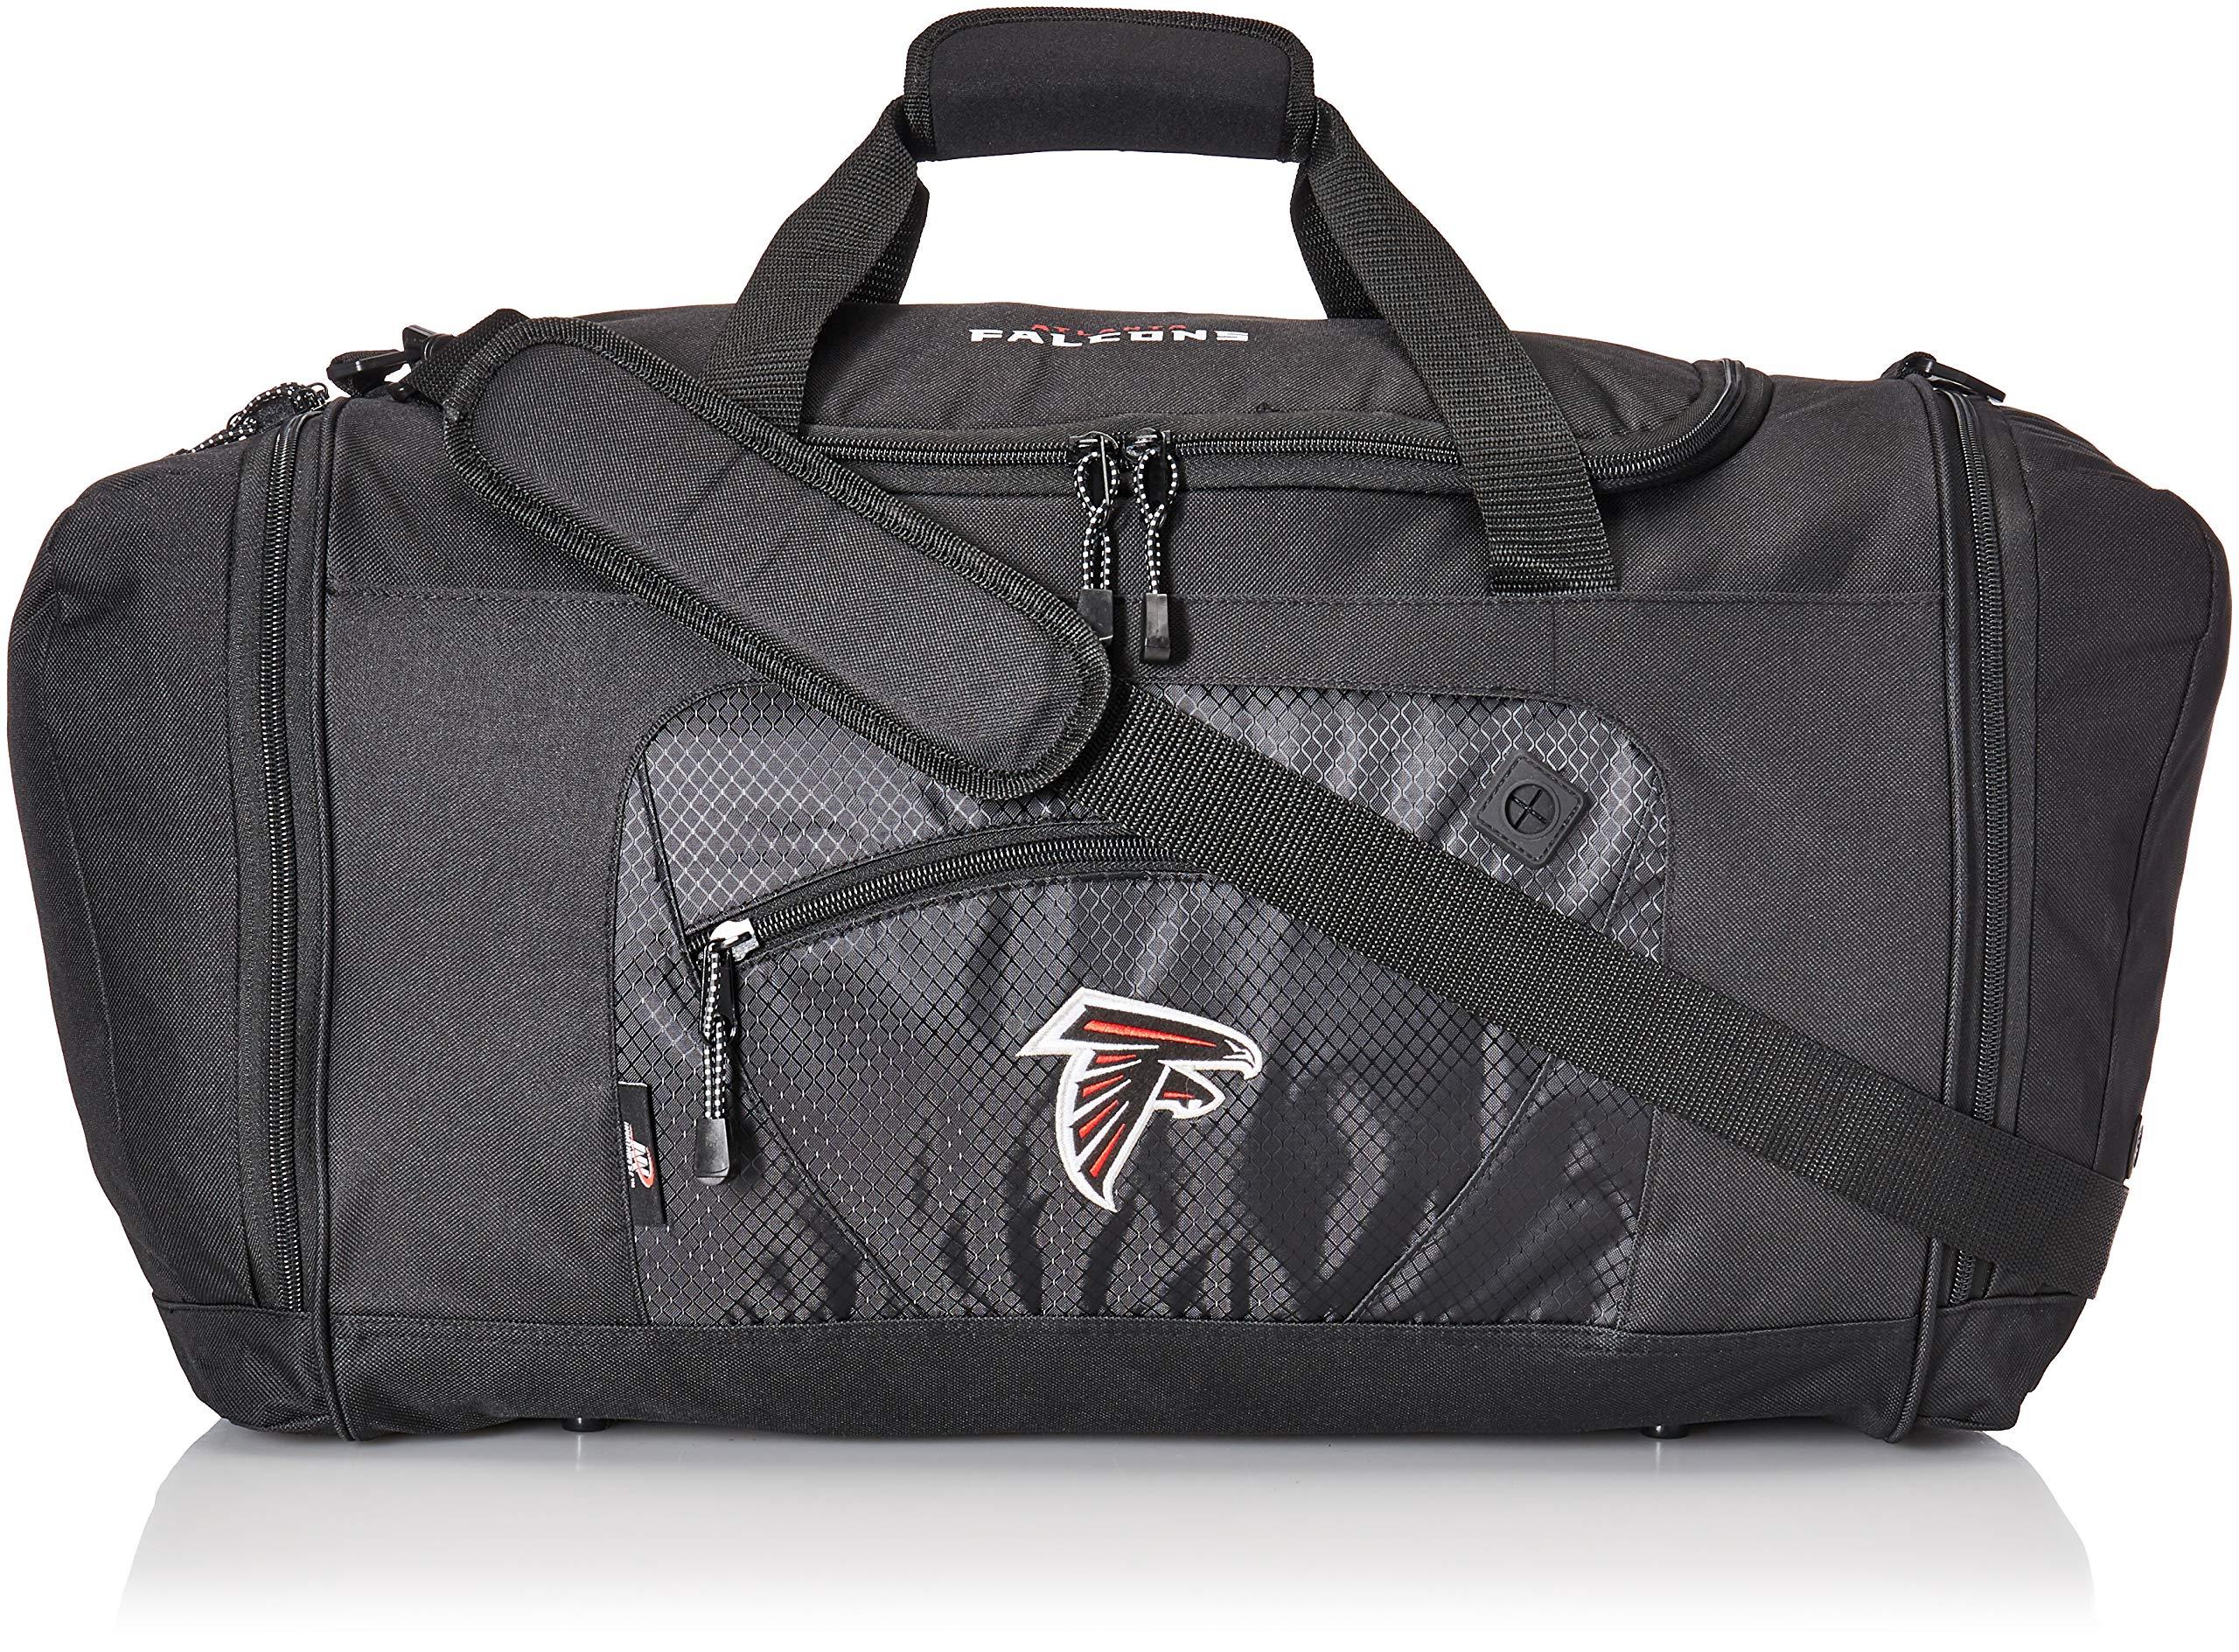 The Northwest Company Officially Licensed NFL Atlanta Falcons Unisex ''Roadblock'' Duffel Bag